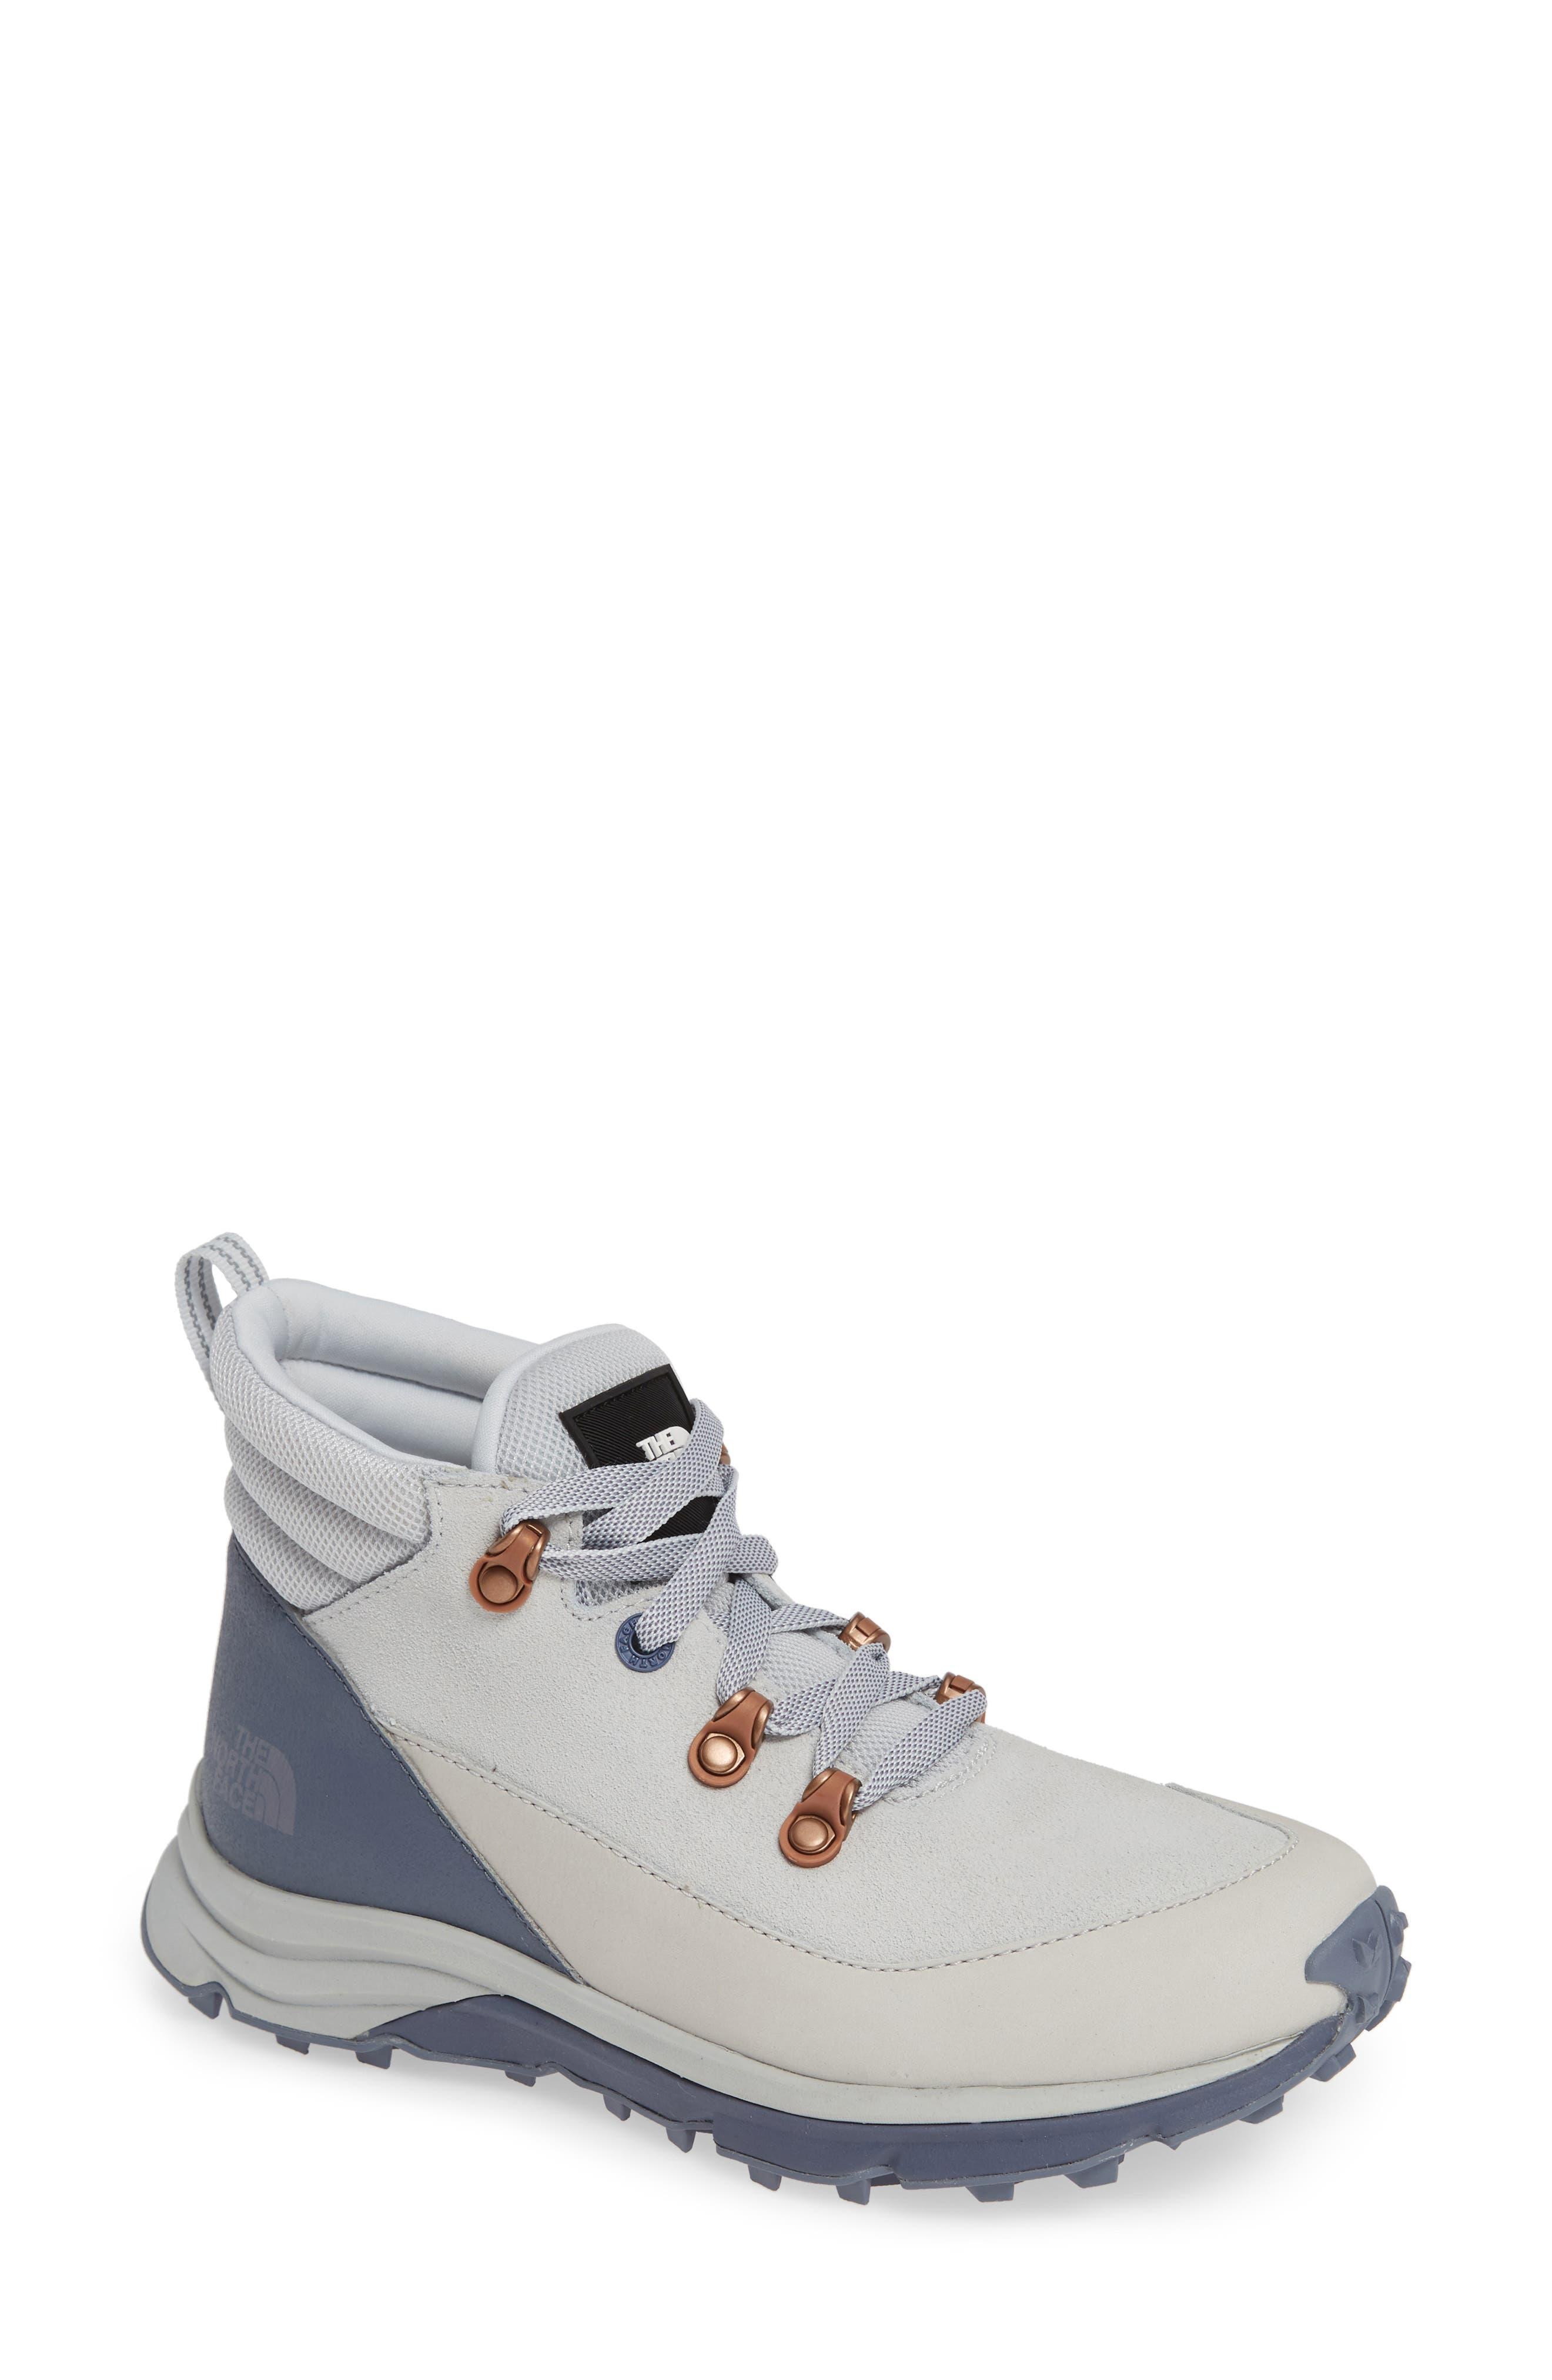 The North Face Raedonda Sneaker Boot, Grey